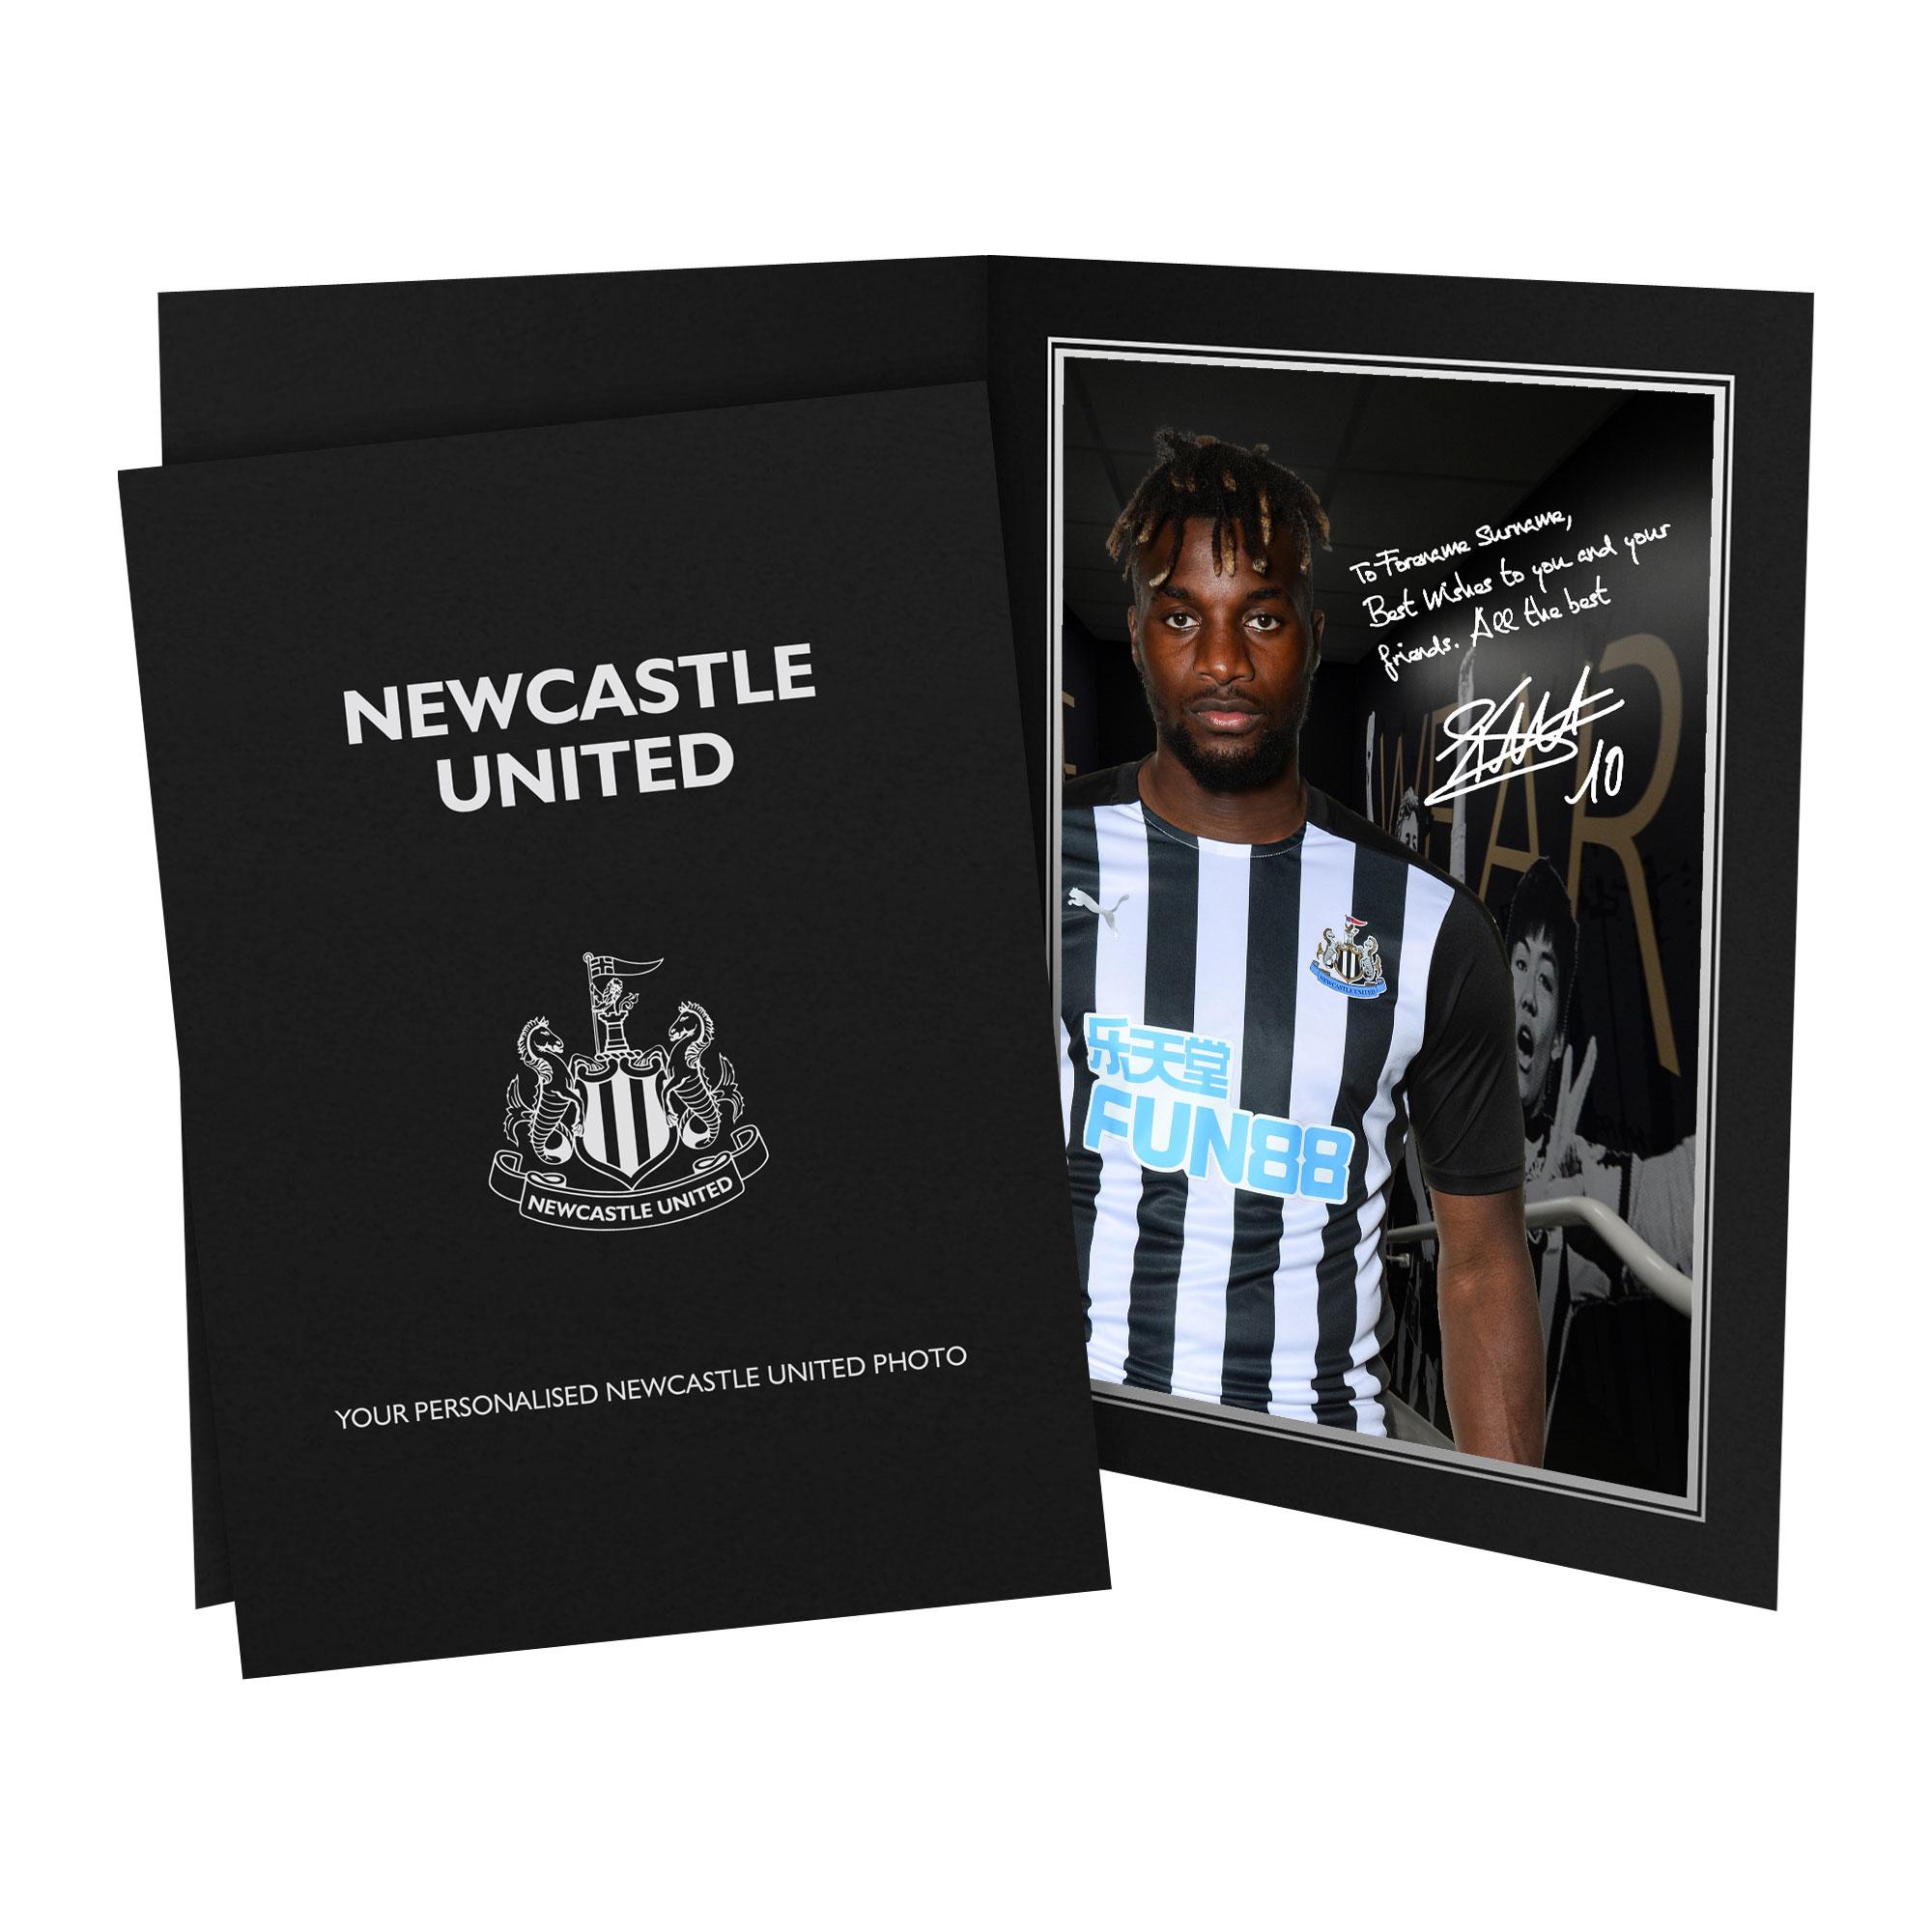 Newcastle United FC Saint-Maximin Autograph Photo Folder